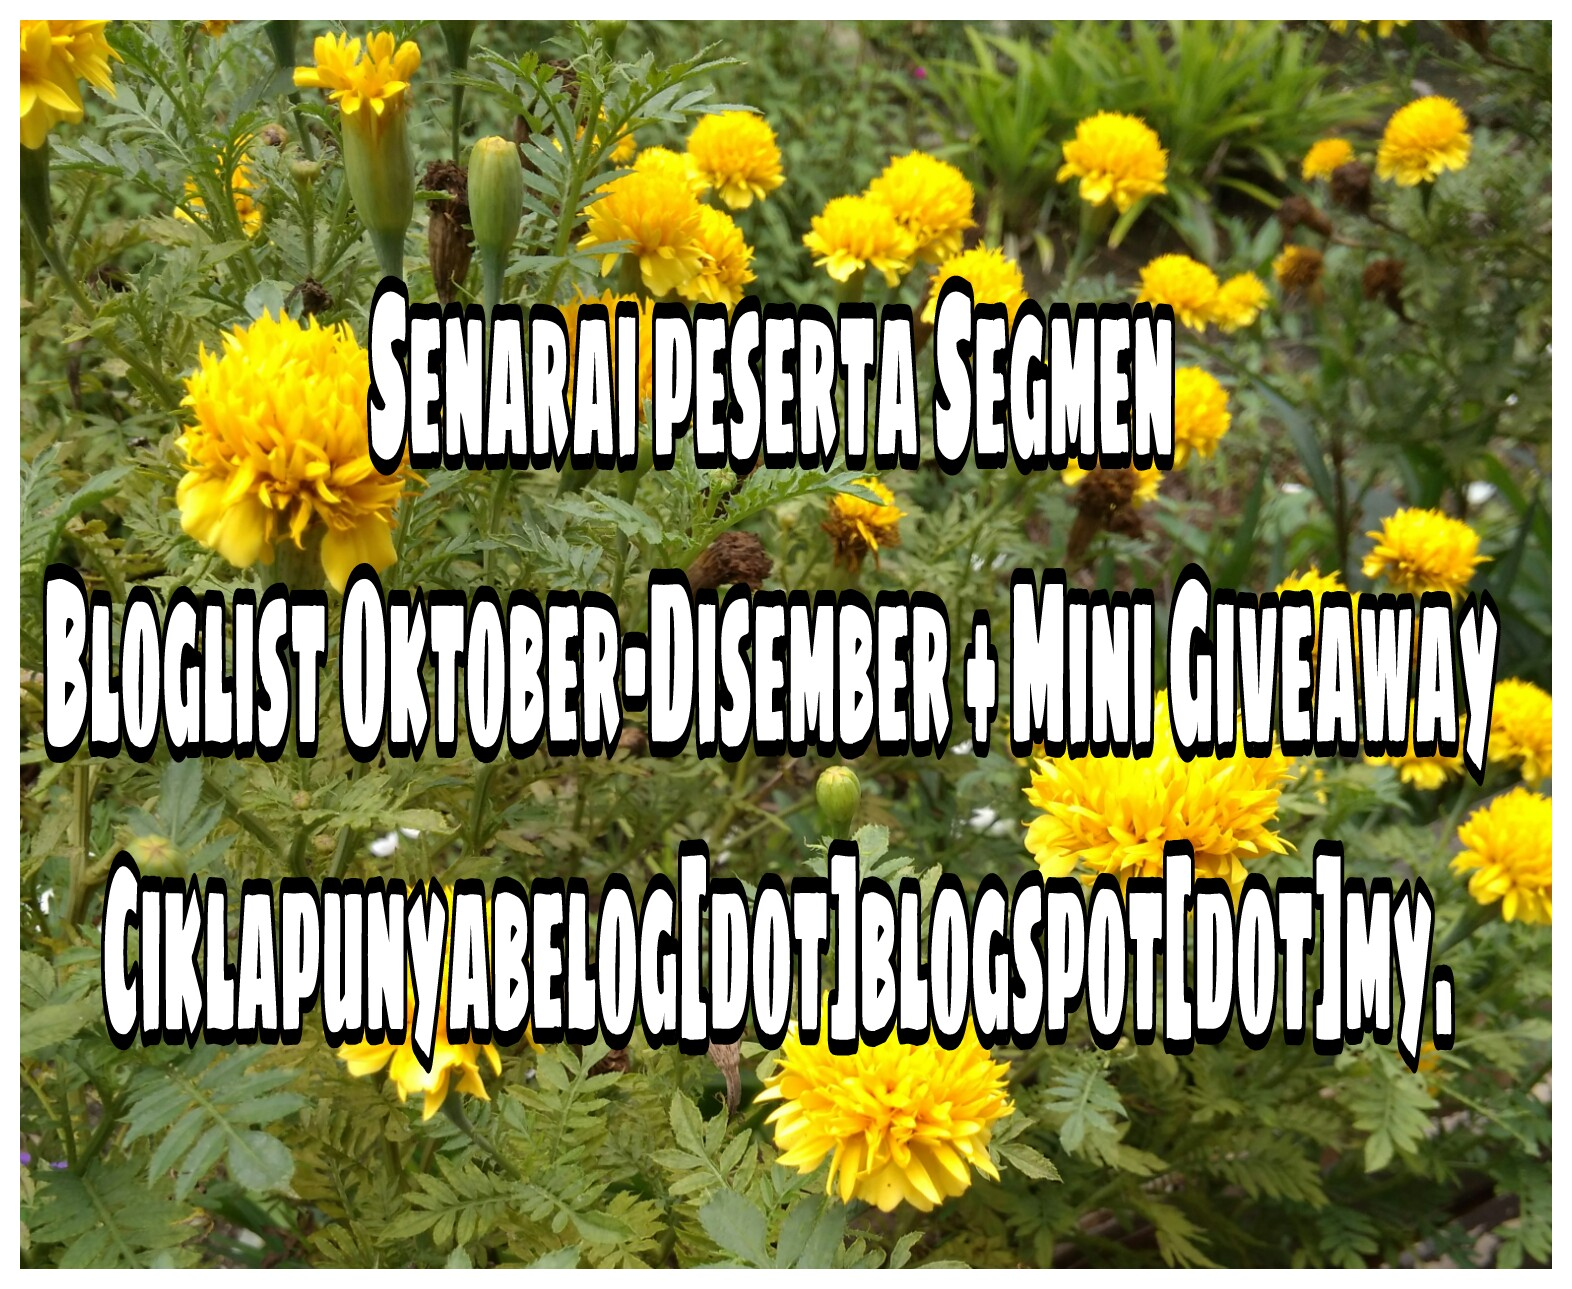 Senarai peserta Segmen Bloglist Oktober-Disember + Mini Giveaway Ciklapunyabelog[dot]blogspot[dot]my.